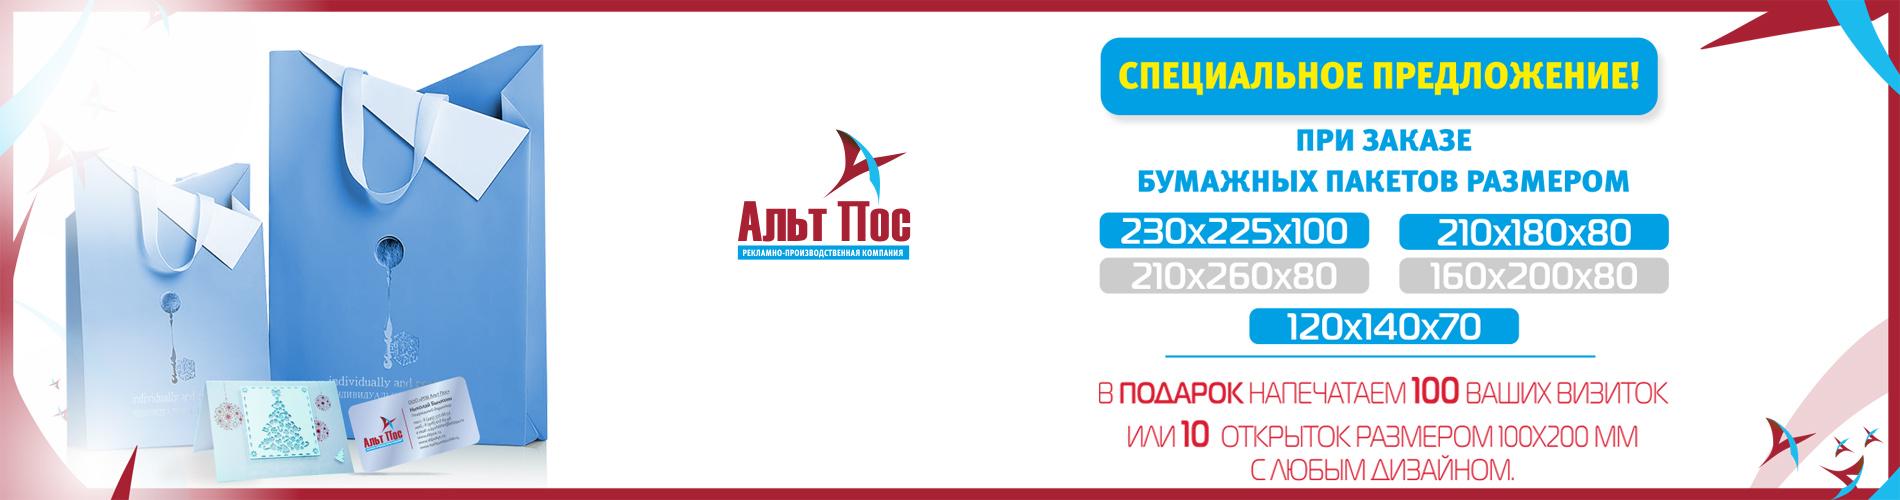 alt-pos.ru